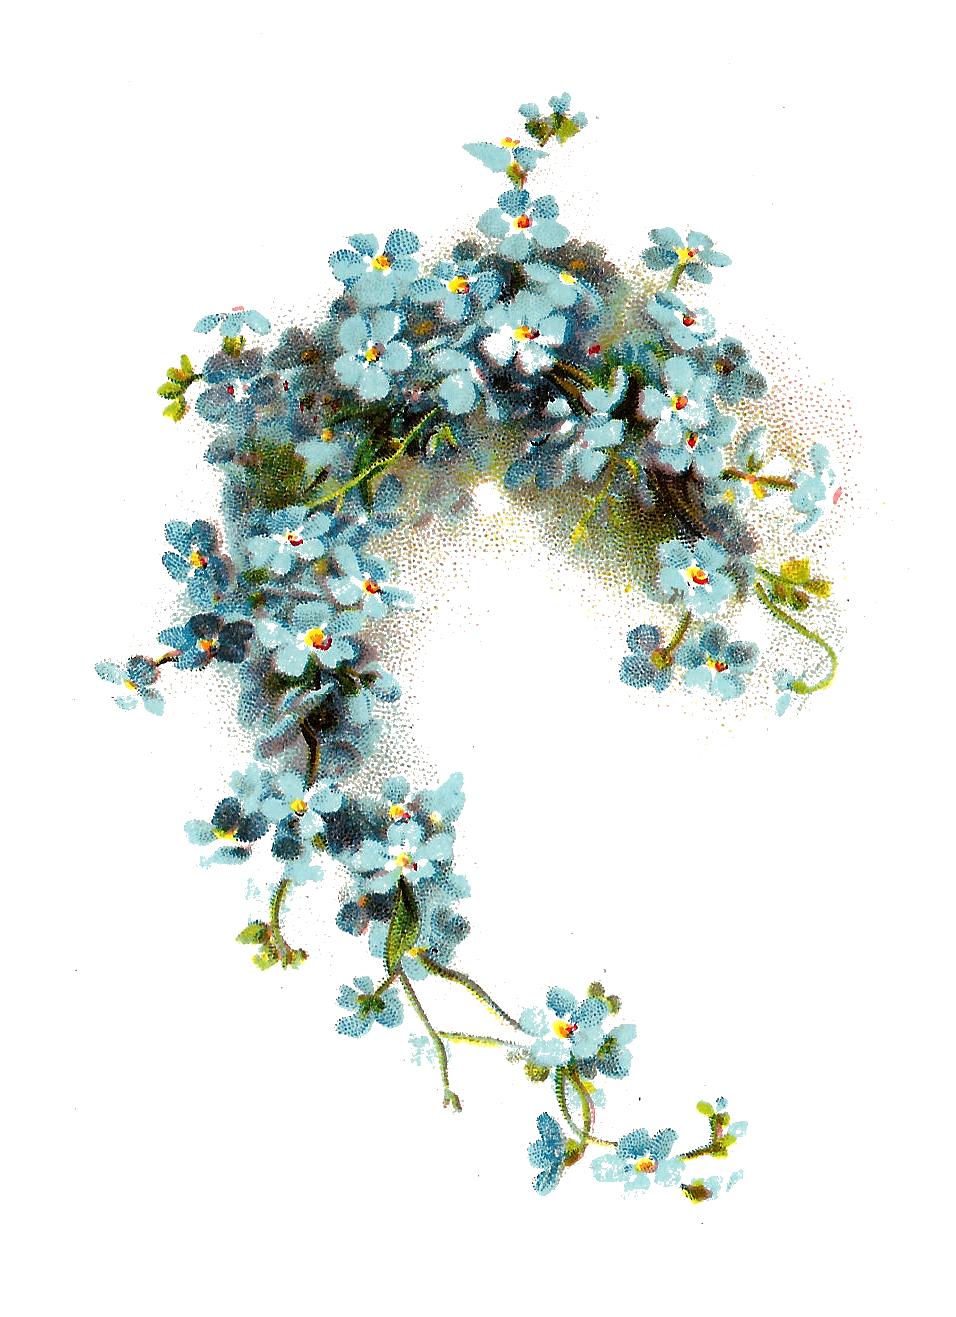 Ivy flower clipart jpg transparent library Image - Flower-clip-art-blue-forget-me-not-flower-graphic-from ... jpg transparent library